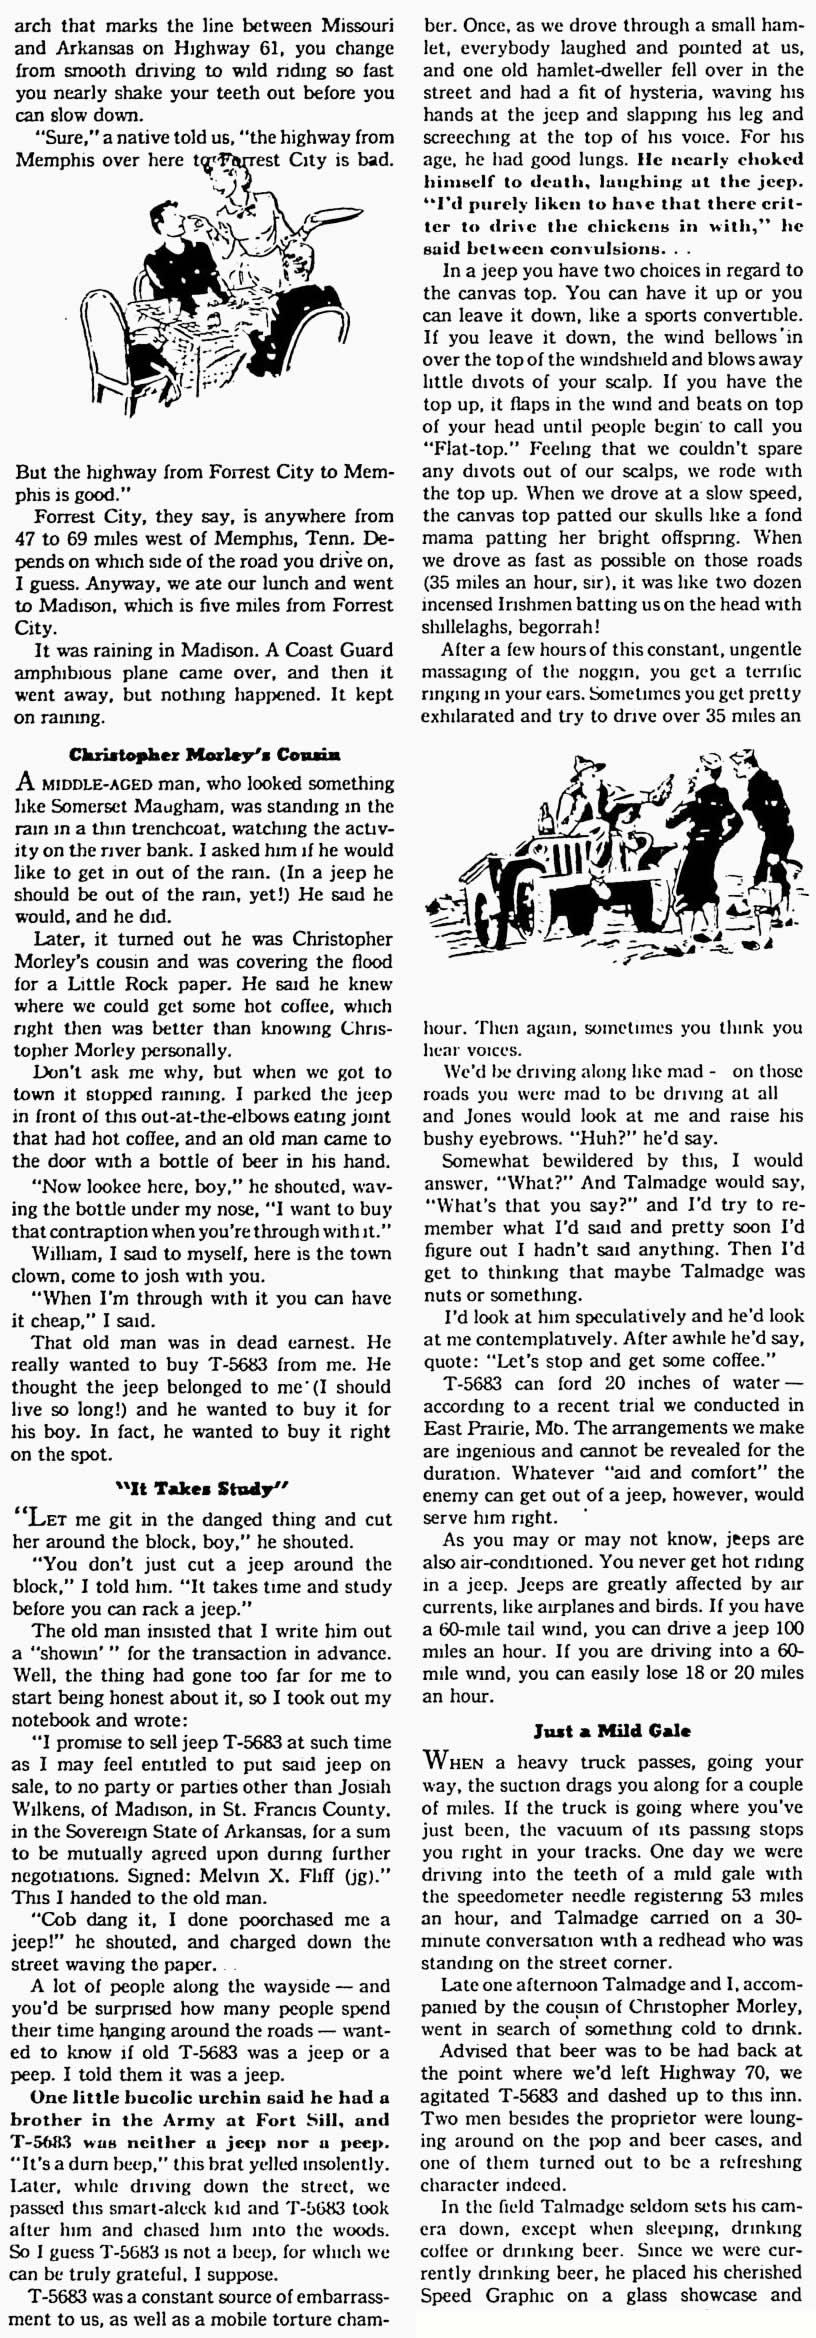 1945-07-15-milwaukee-journal-jeep-tamer4